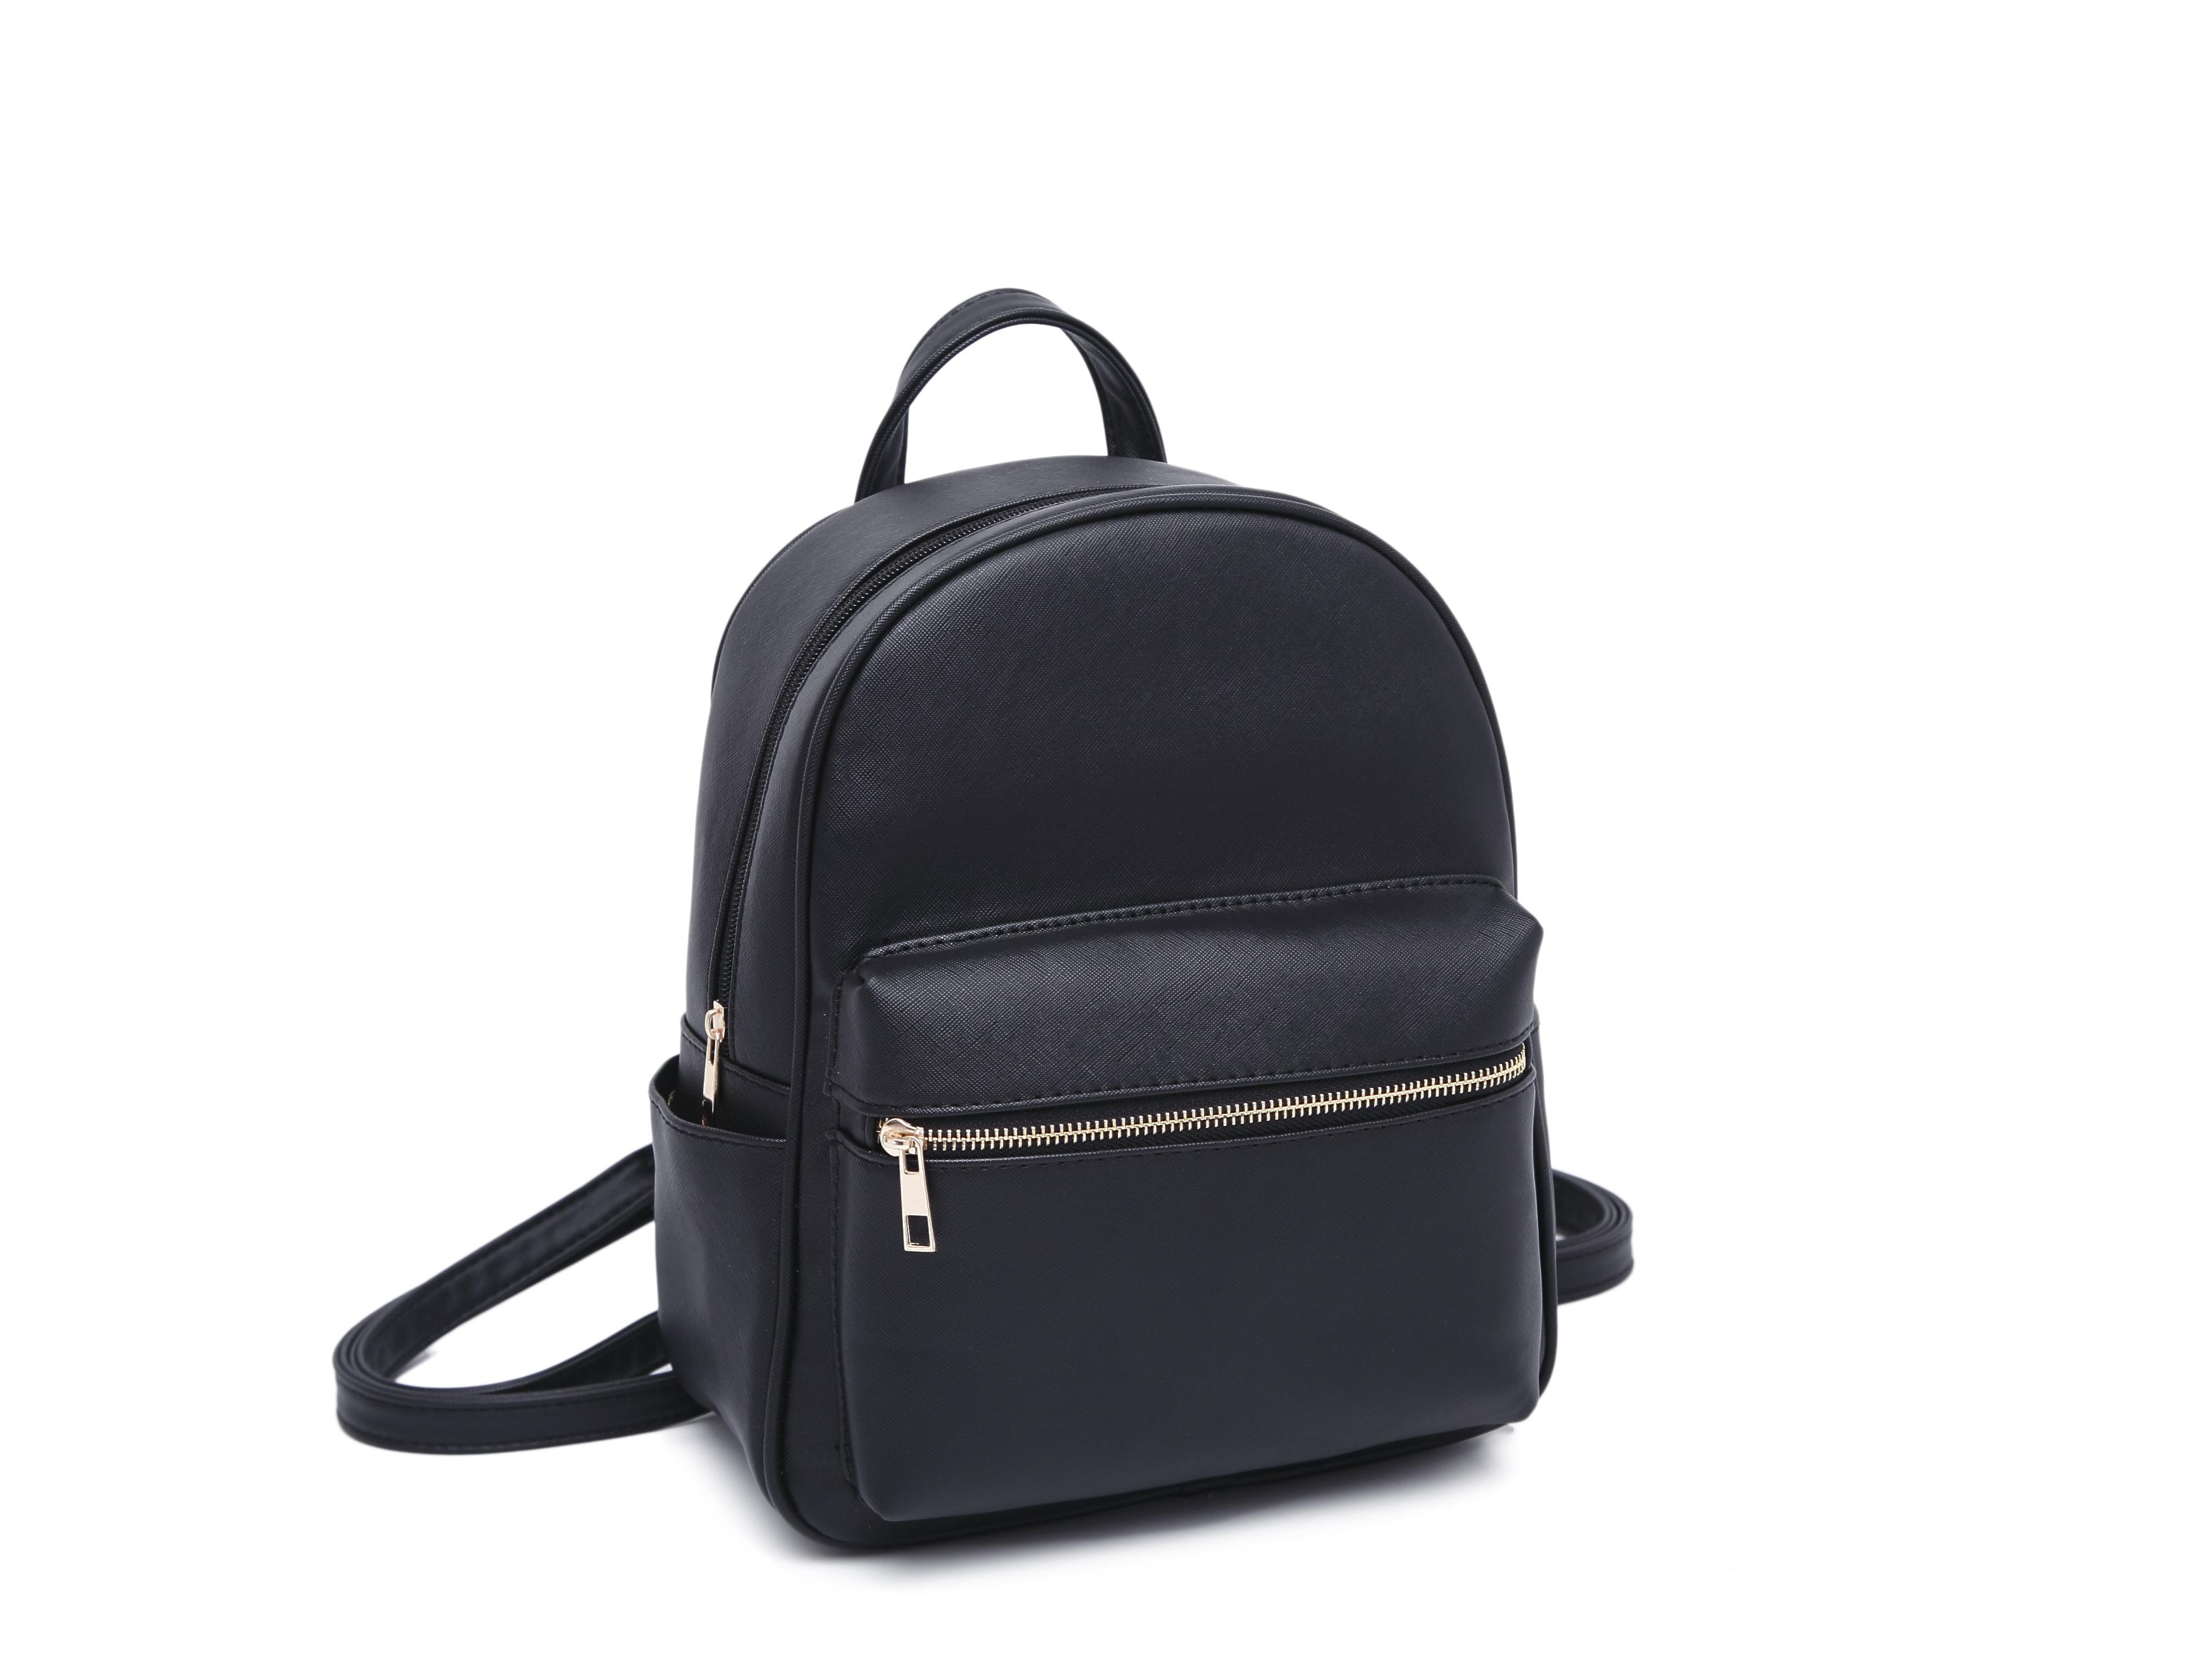 Light Brown Macbook Backpack Leather Rucksack for Woman School Laptop Bag Brown LEATHER BACKPACK Ladies Backpack